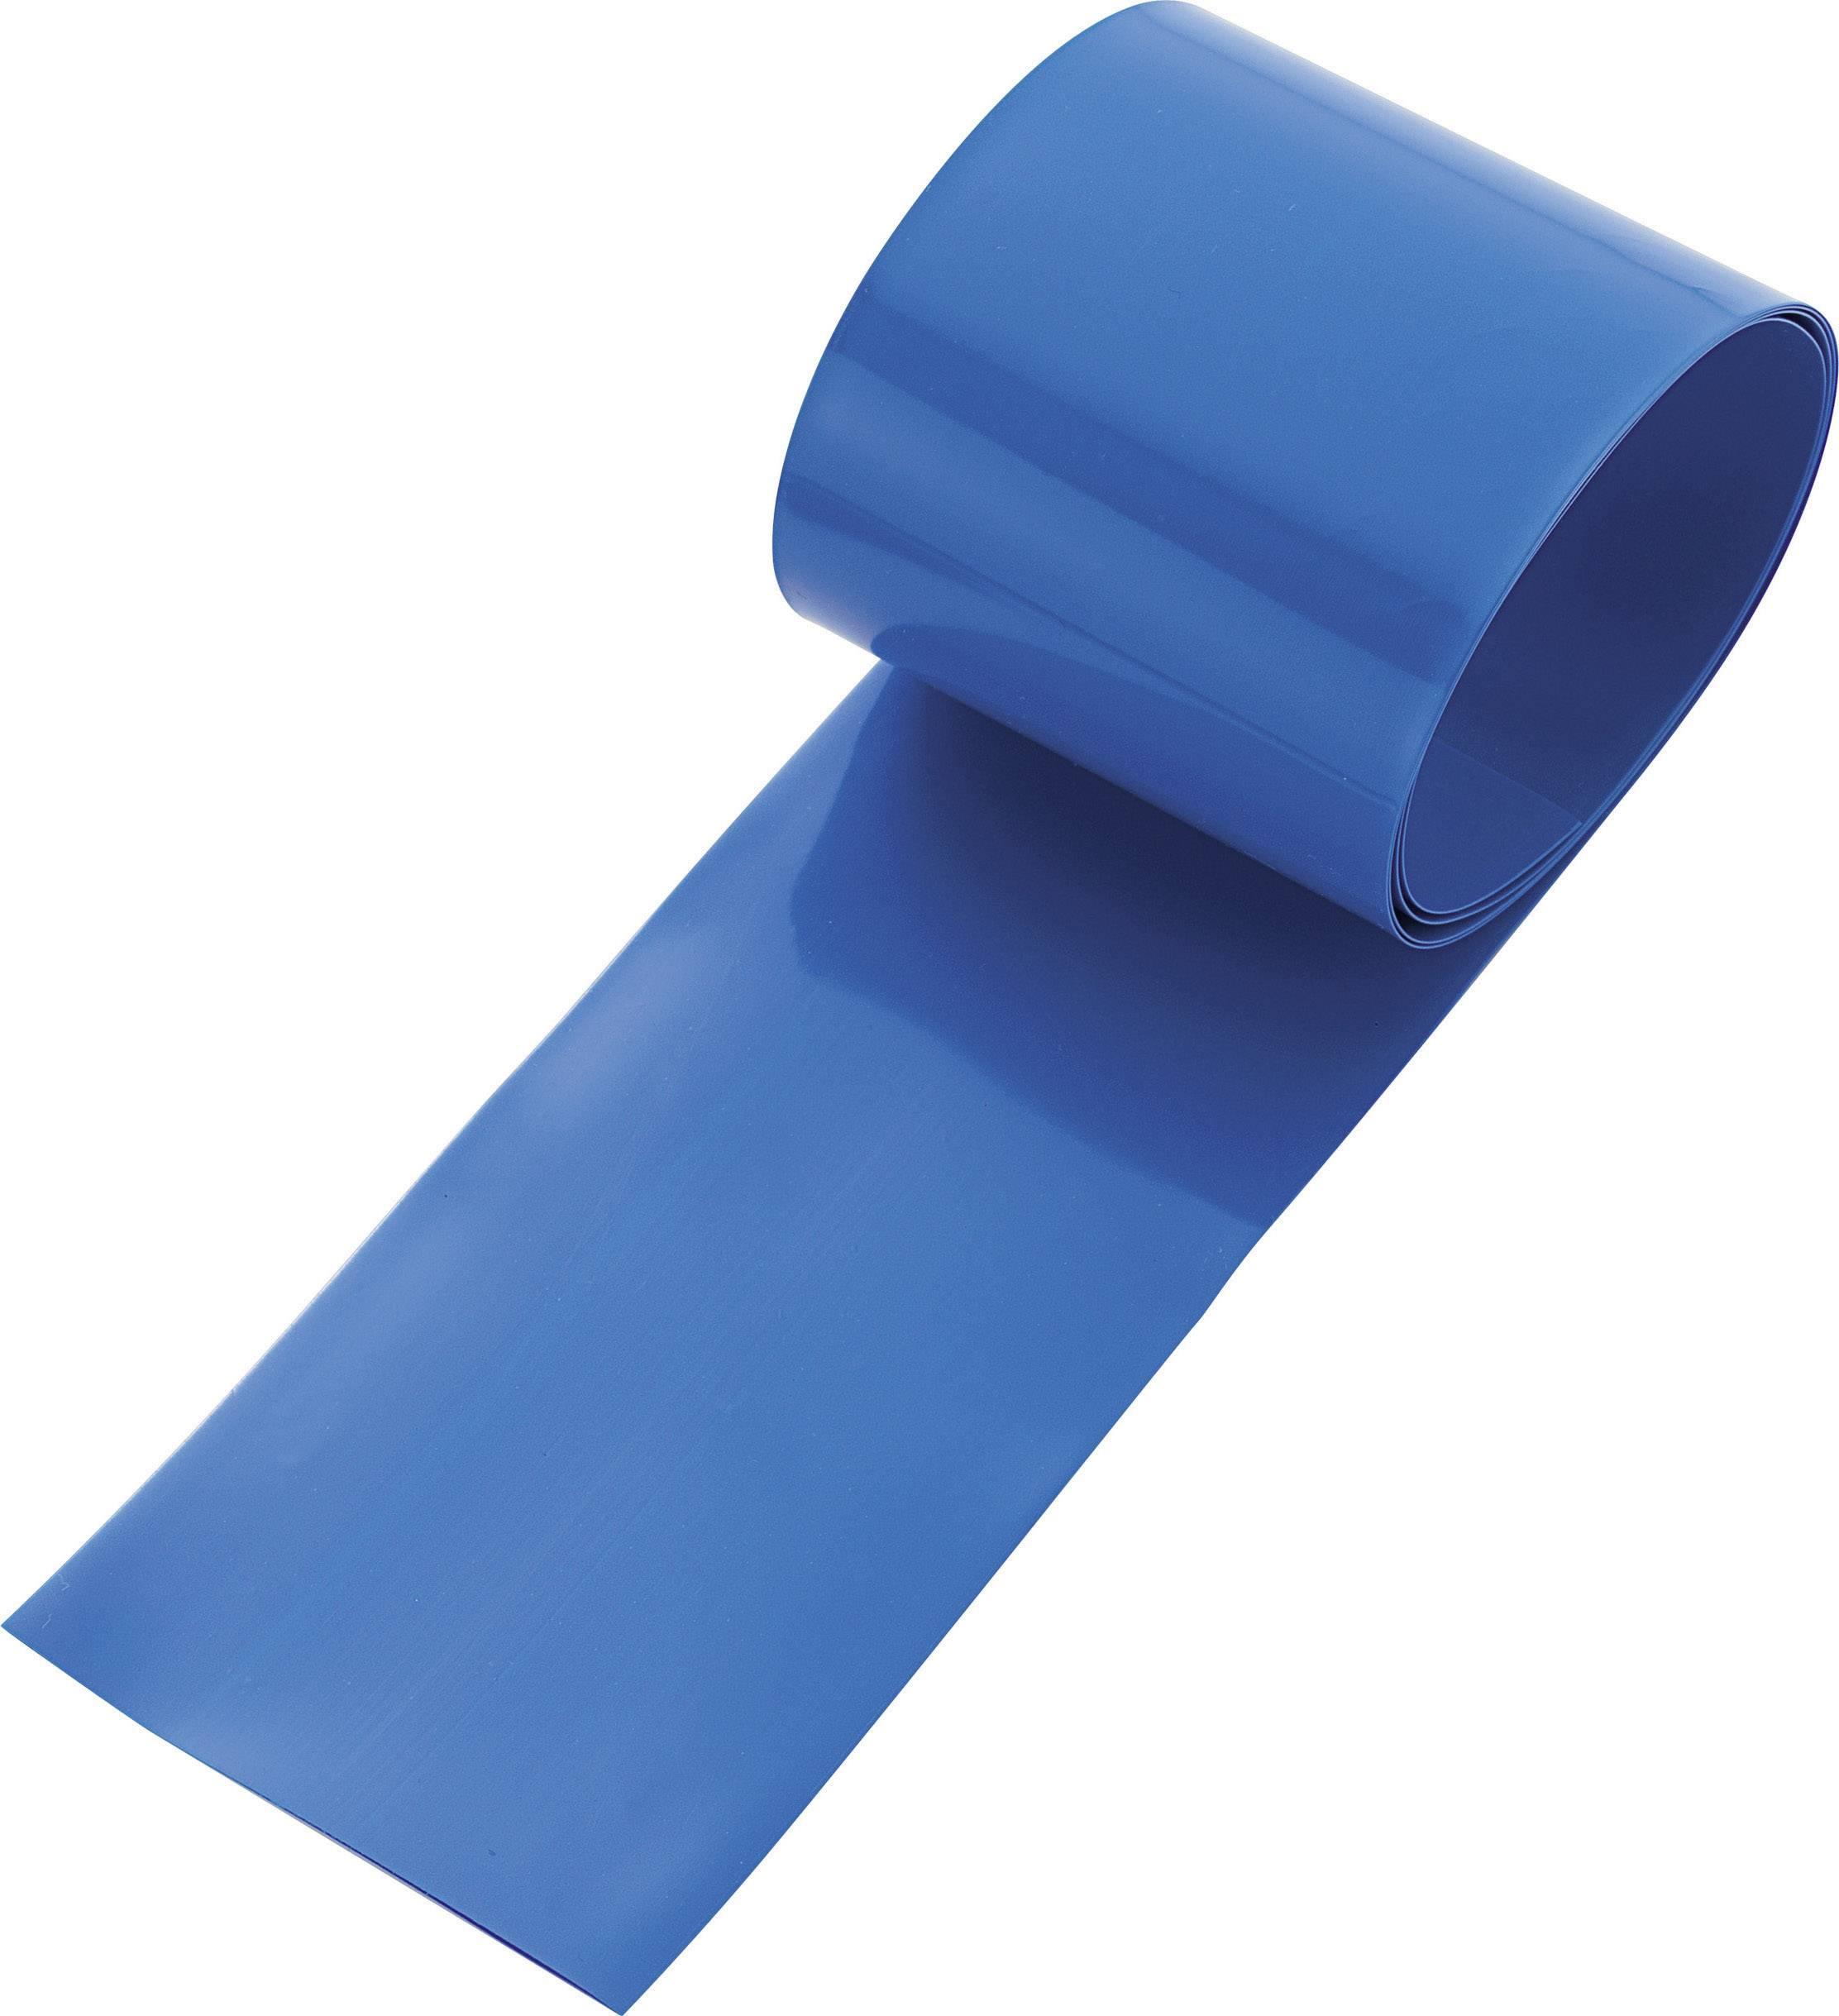 Smršťovací bužírka na akumulátory, bez lepidla TRU COMPONENTS 93014c88e, 130 mm, modrá, 1 ks